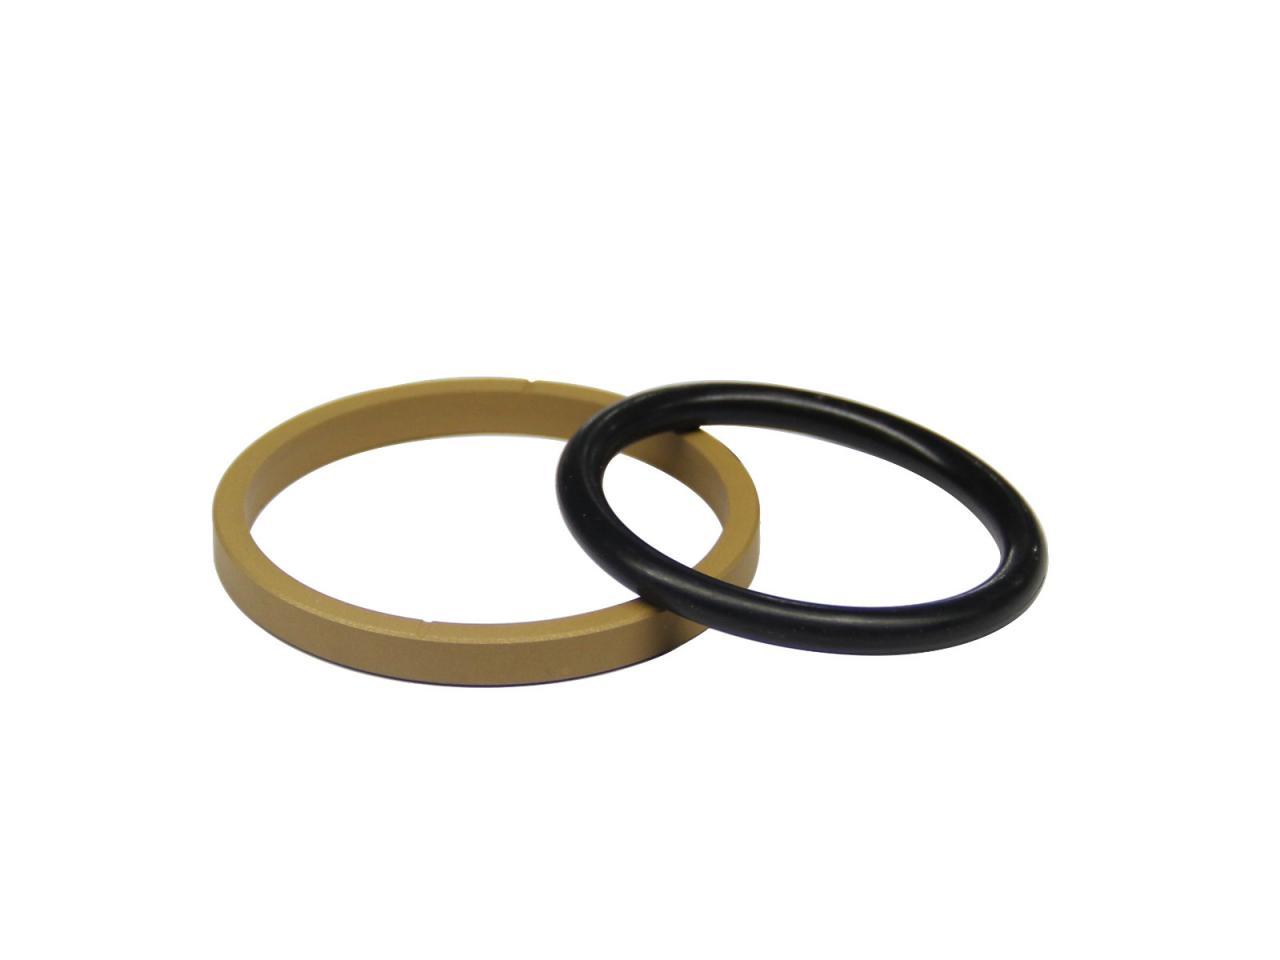 DSH-Piston Seal Design | Piston Seal Bronze Filled PTFE Glyd Ring-4